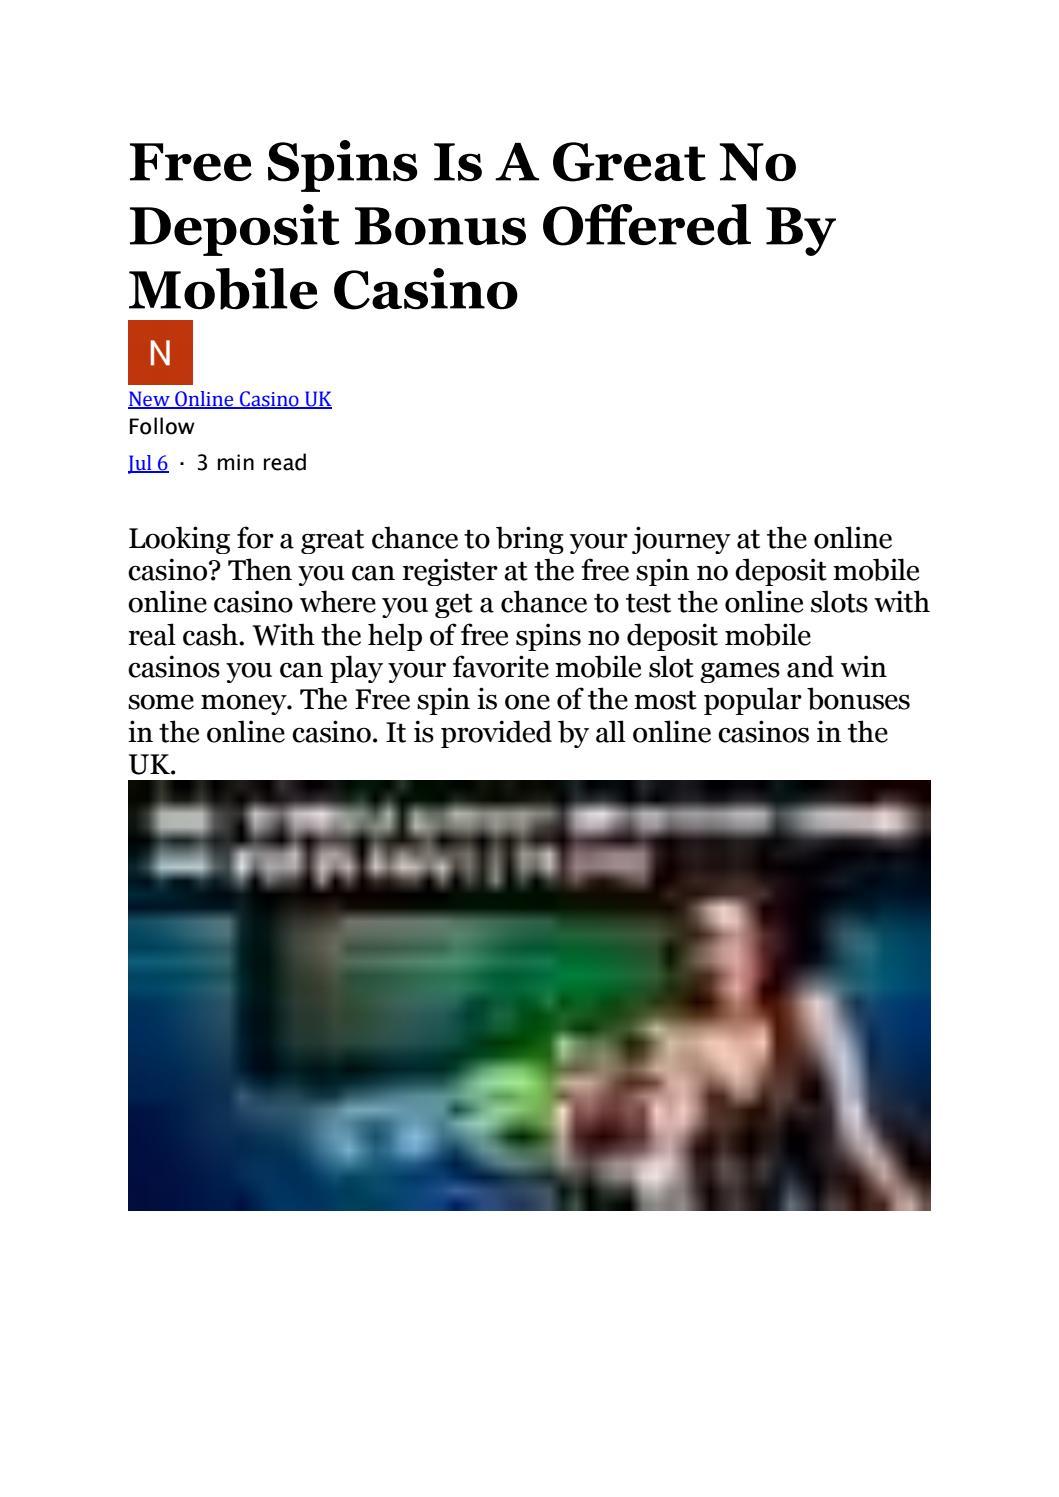 Online Casino No Deposit Bonus Uk